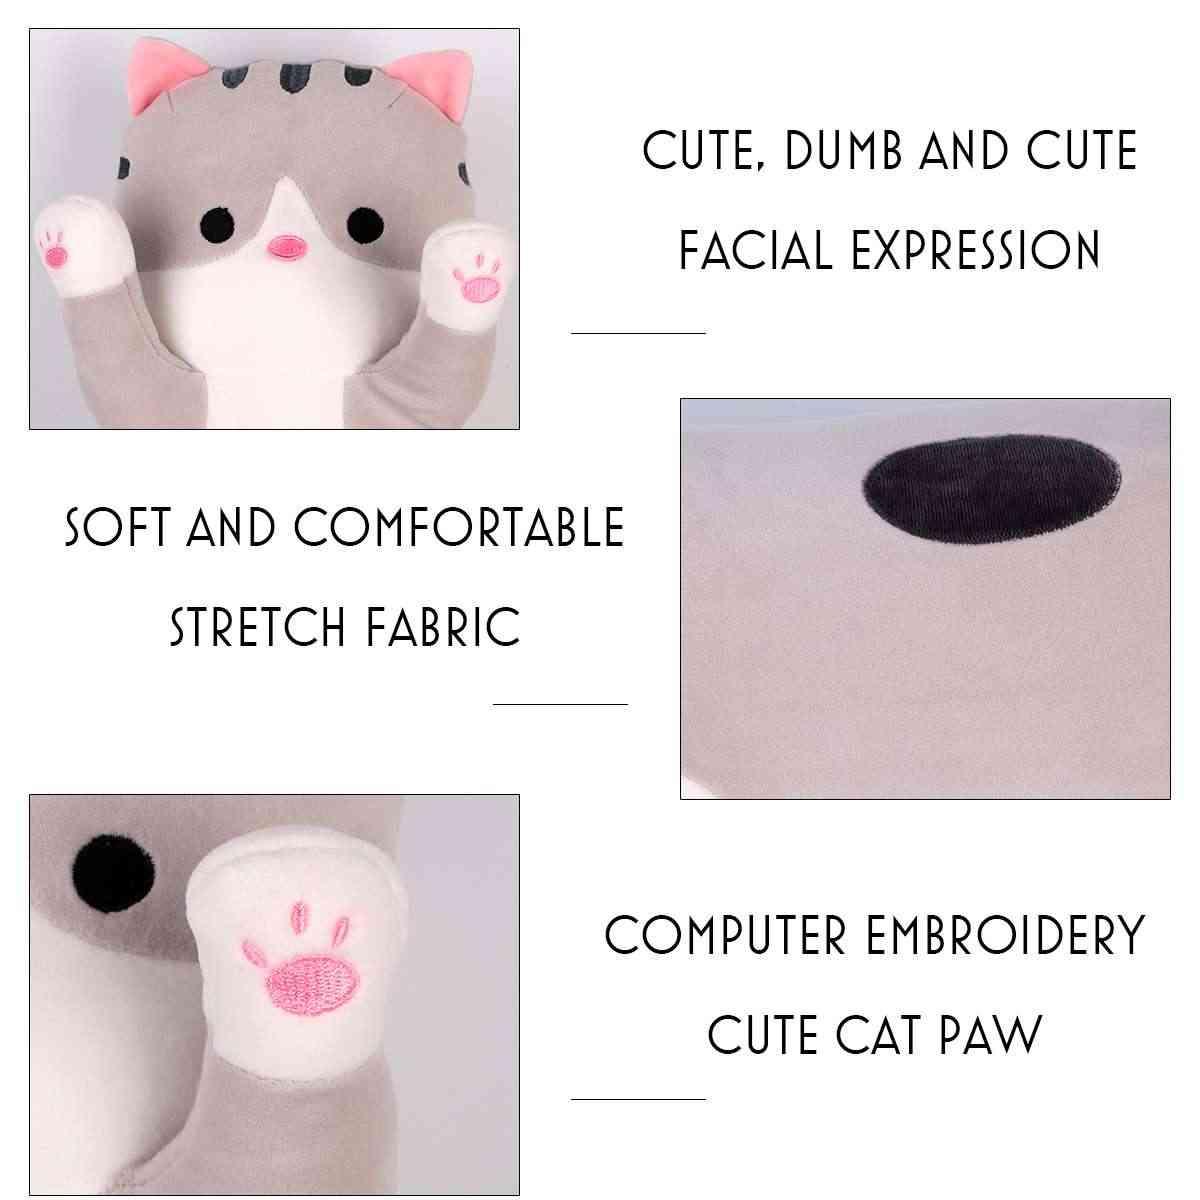 Plush Toys Animal Cat Cute Creative Long Soft Toys Office Lunch Break Nap Sleeping Pillow Cushion Stuffed Gift Doll for Kids